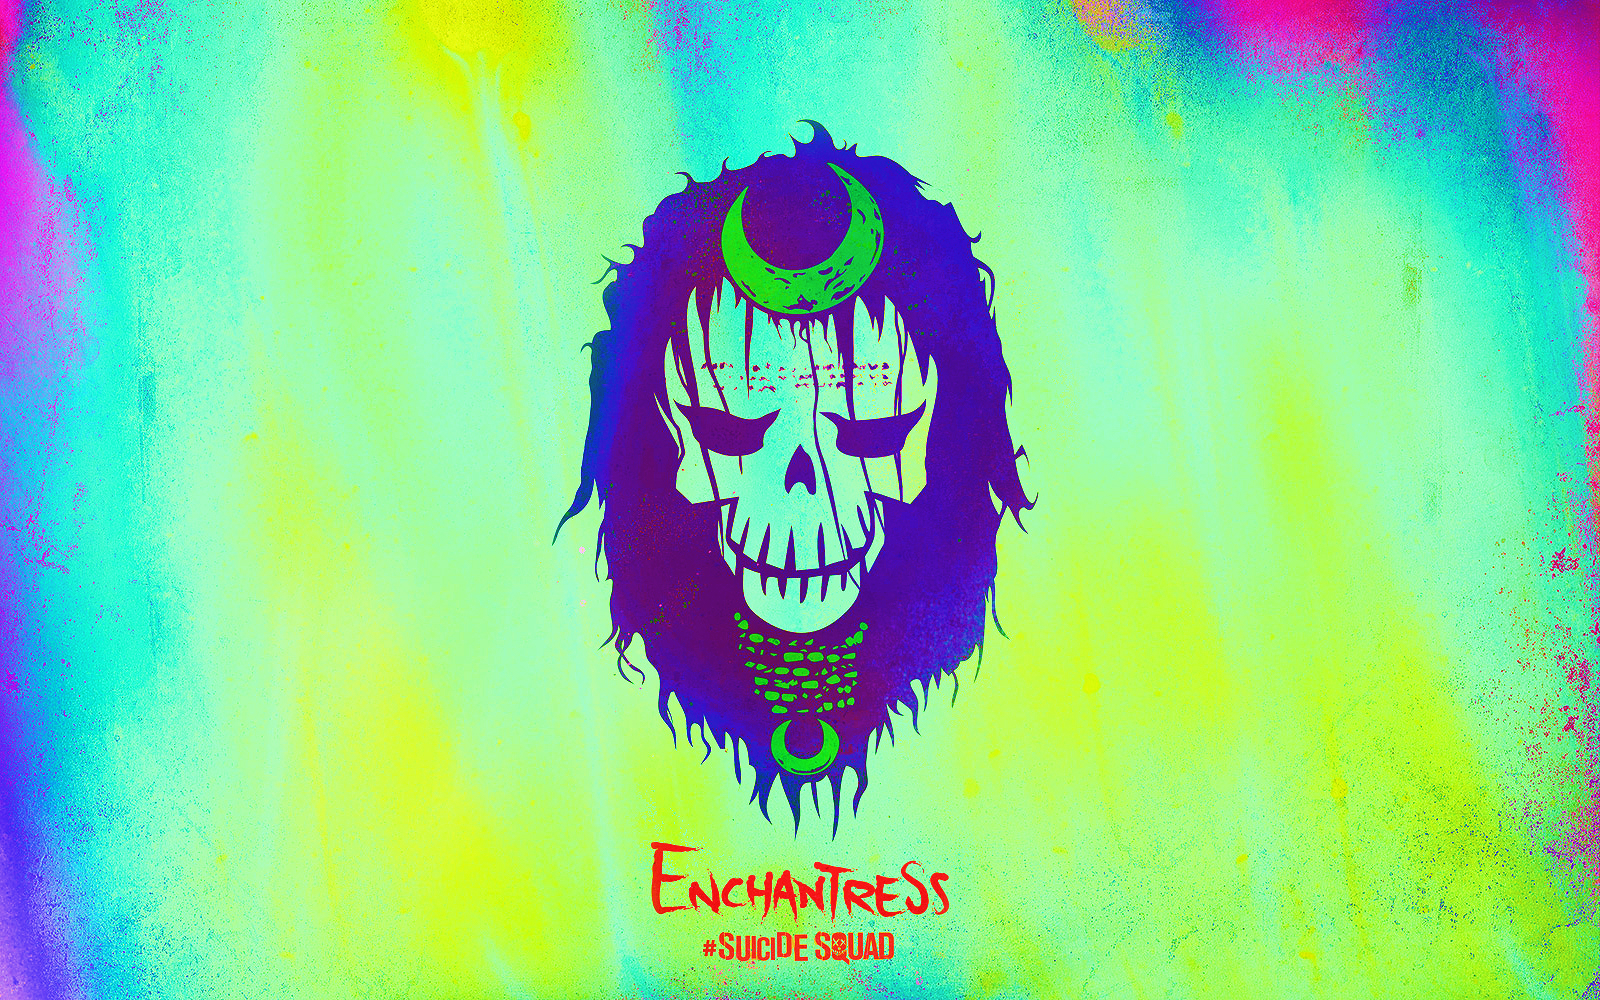 Suicide Squad Skull wallpaper - Enchantress